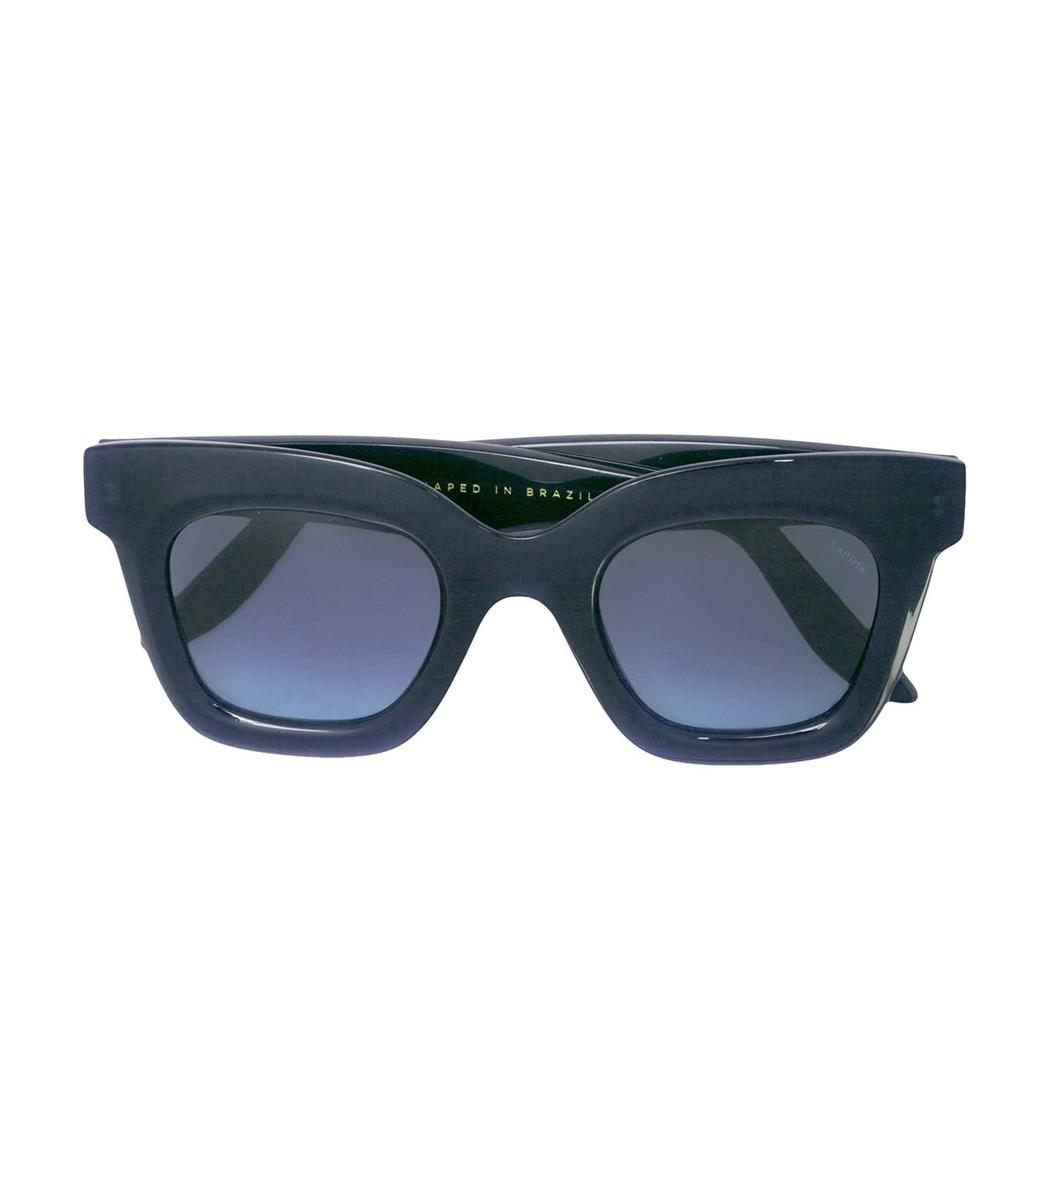 LAPIMA Lisa Sunglasses in Black